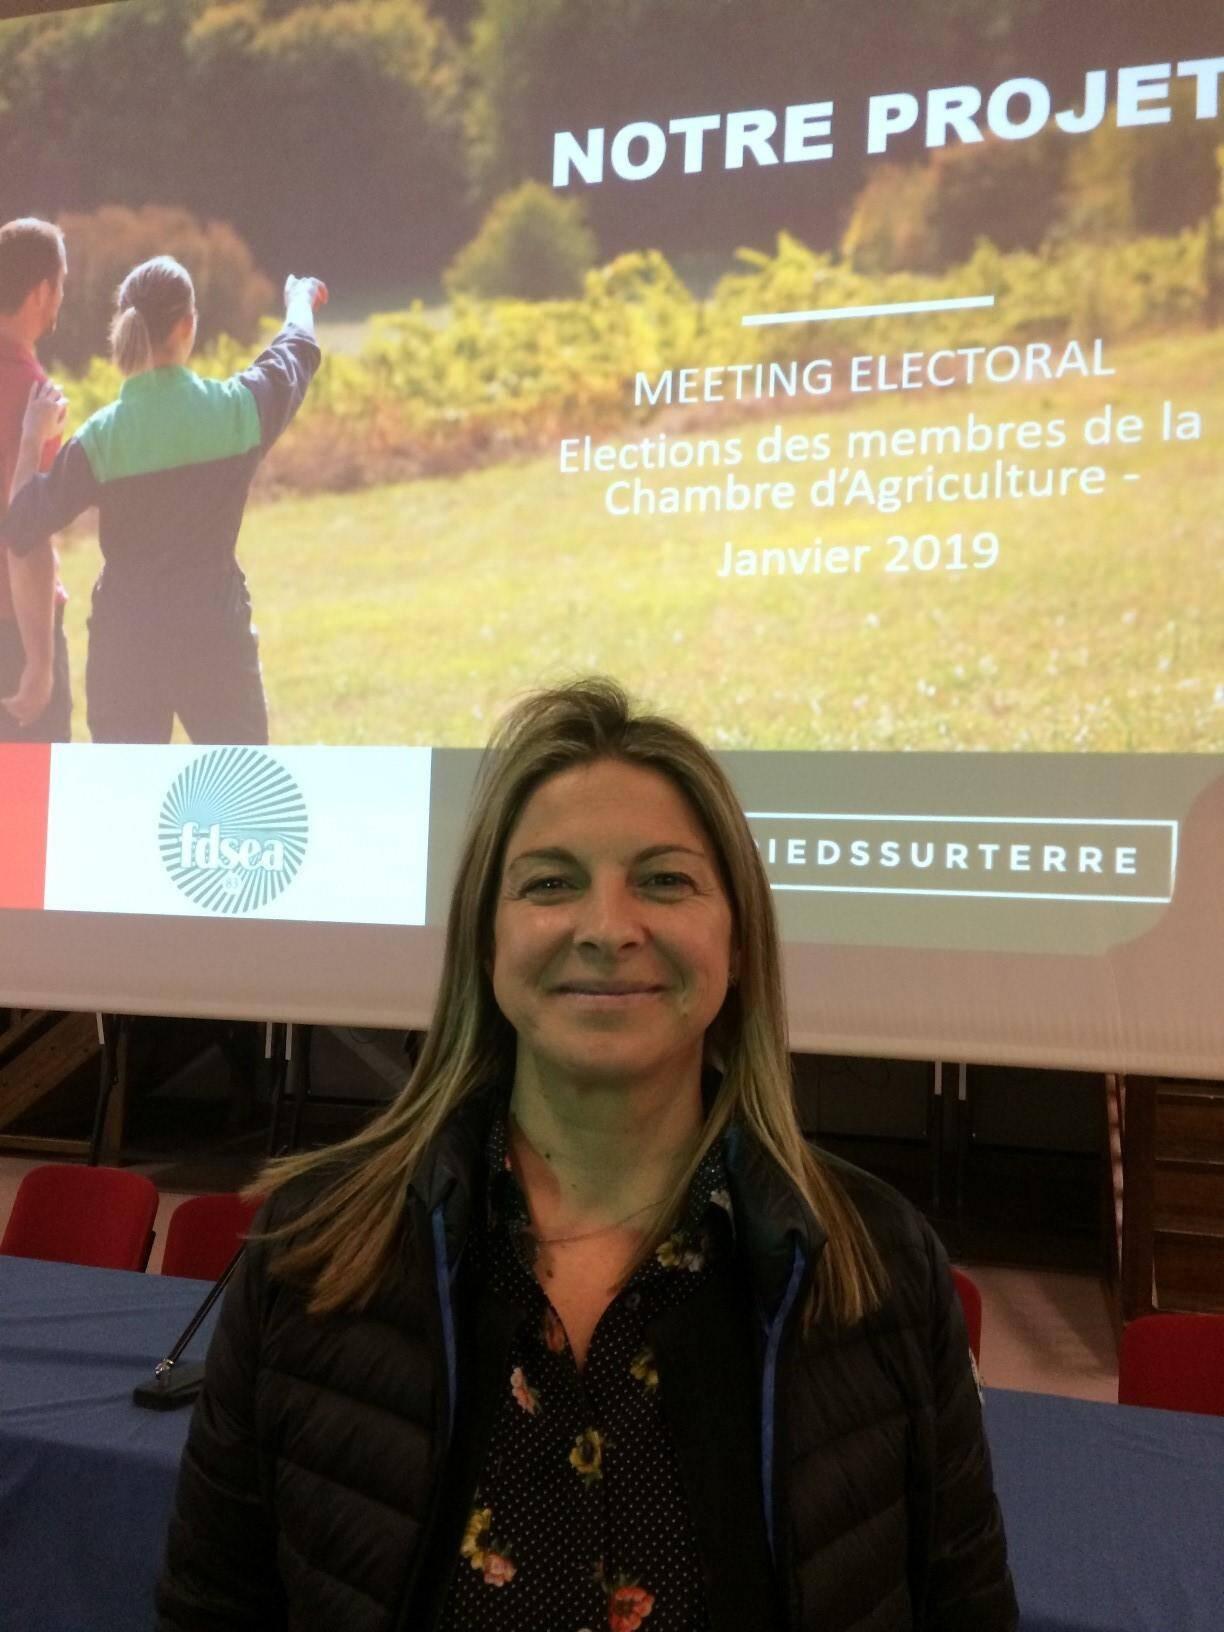 Fabienne Joly, tête de liste de la FDSEA est vigneronne